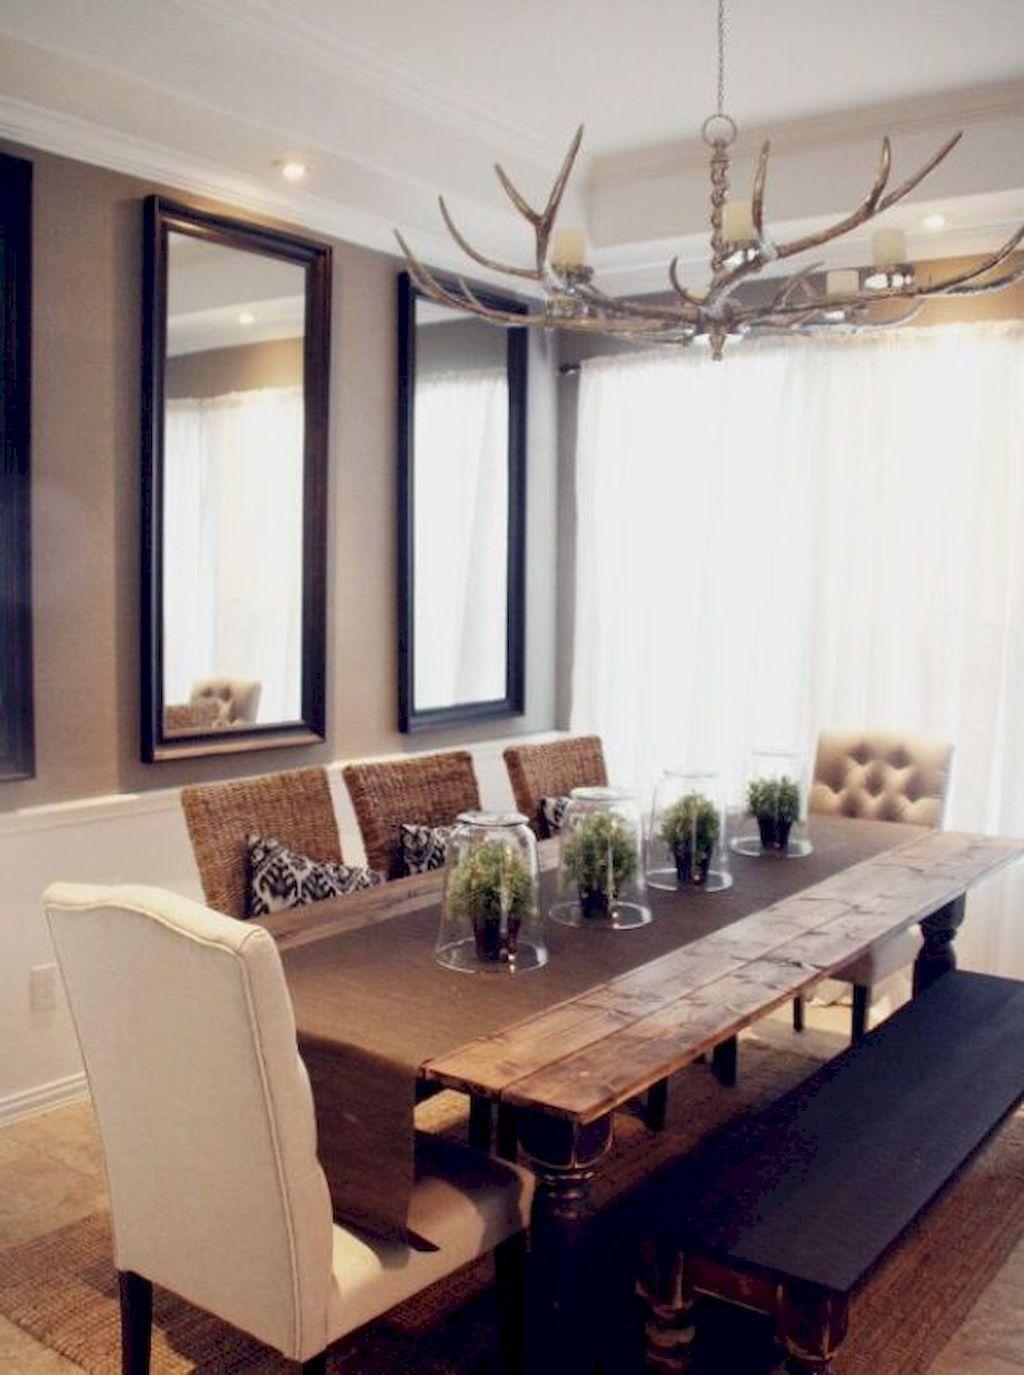 Enhance Dinning Room With Farmhouse Table Home To Z Modern Farmhouse Dining Room Farmhouse Dining Rooms Decor Modern Dining Room